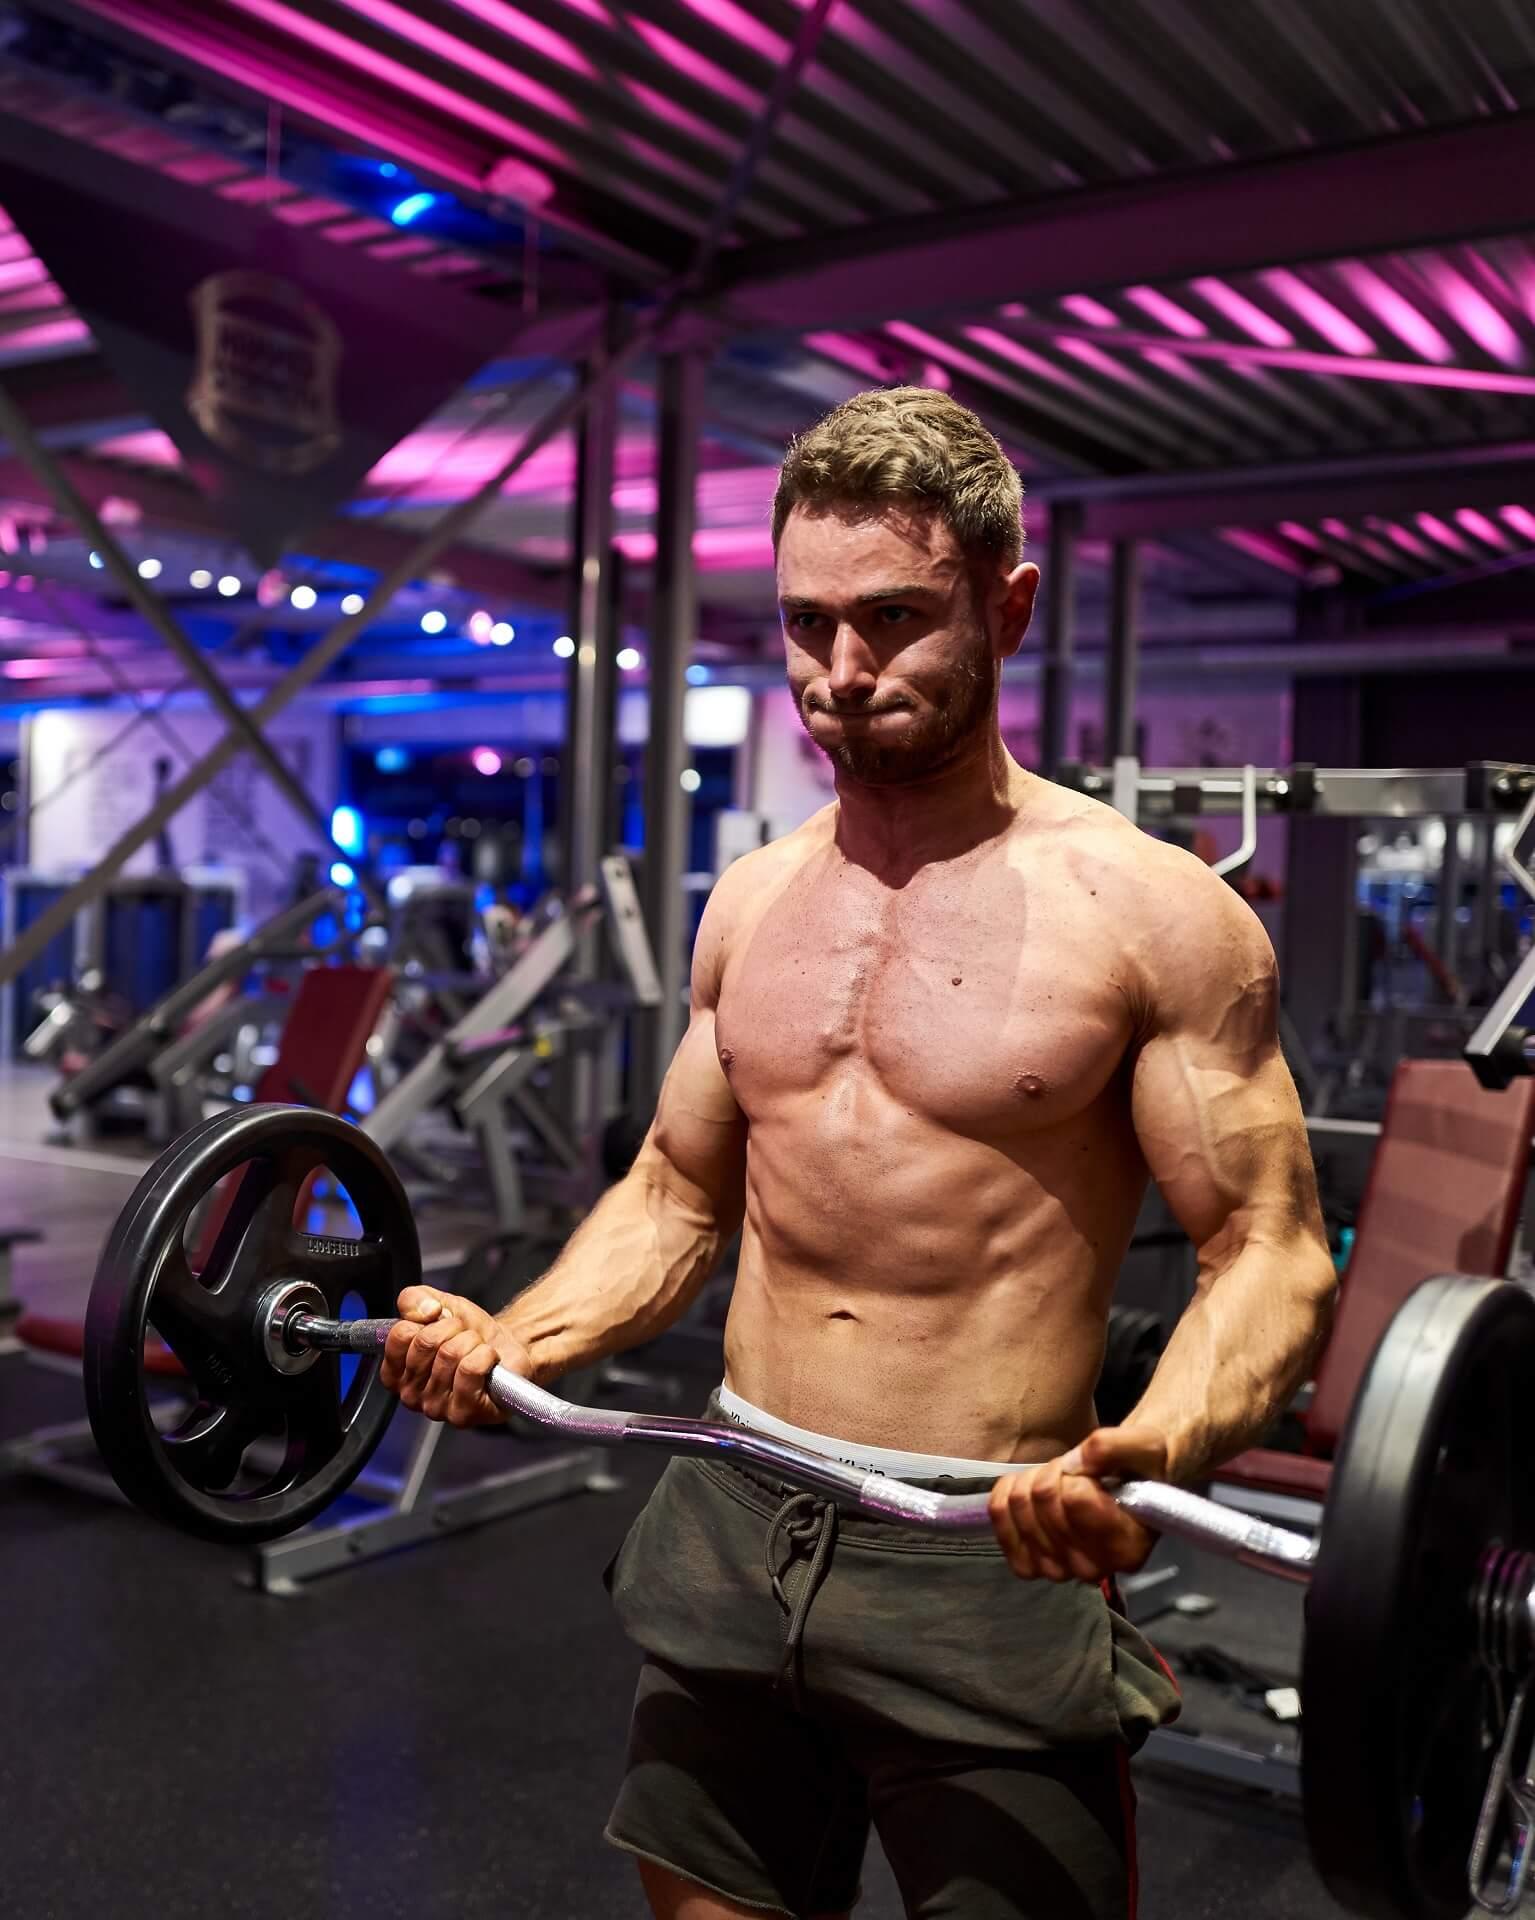 red-rab-fitnessstudio-bizepscurls-bodybuilding-patrick-duffner-mobile